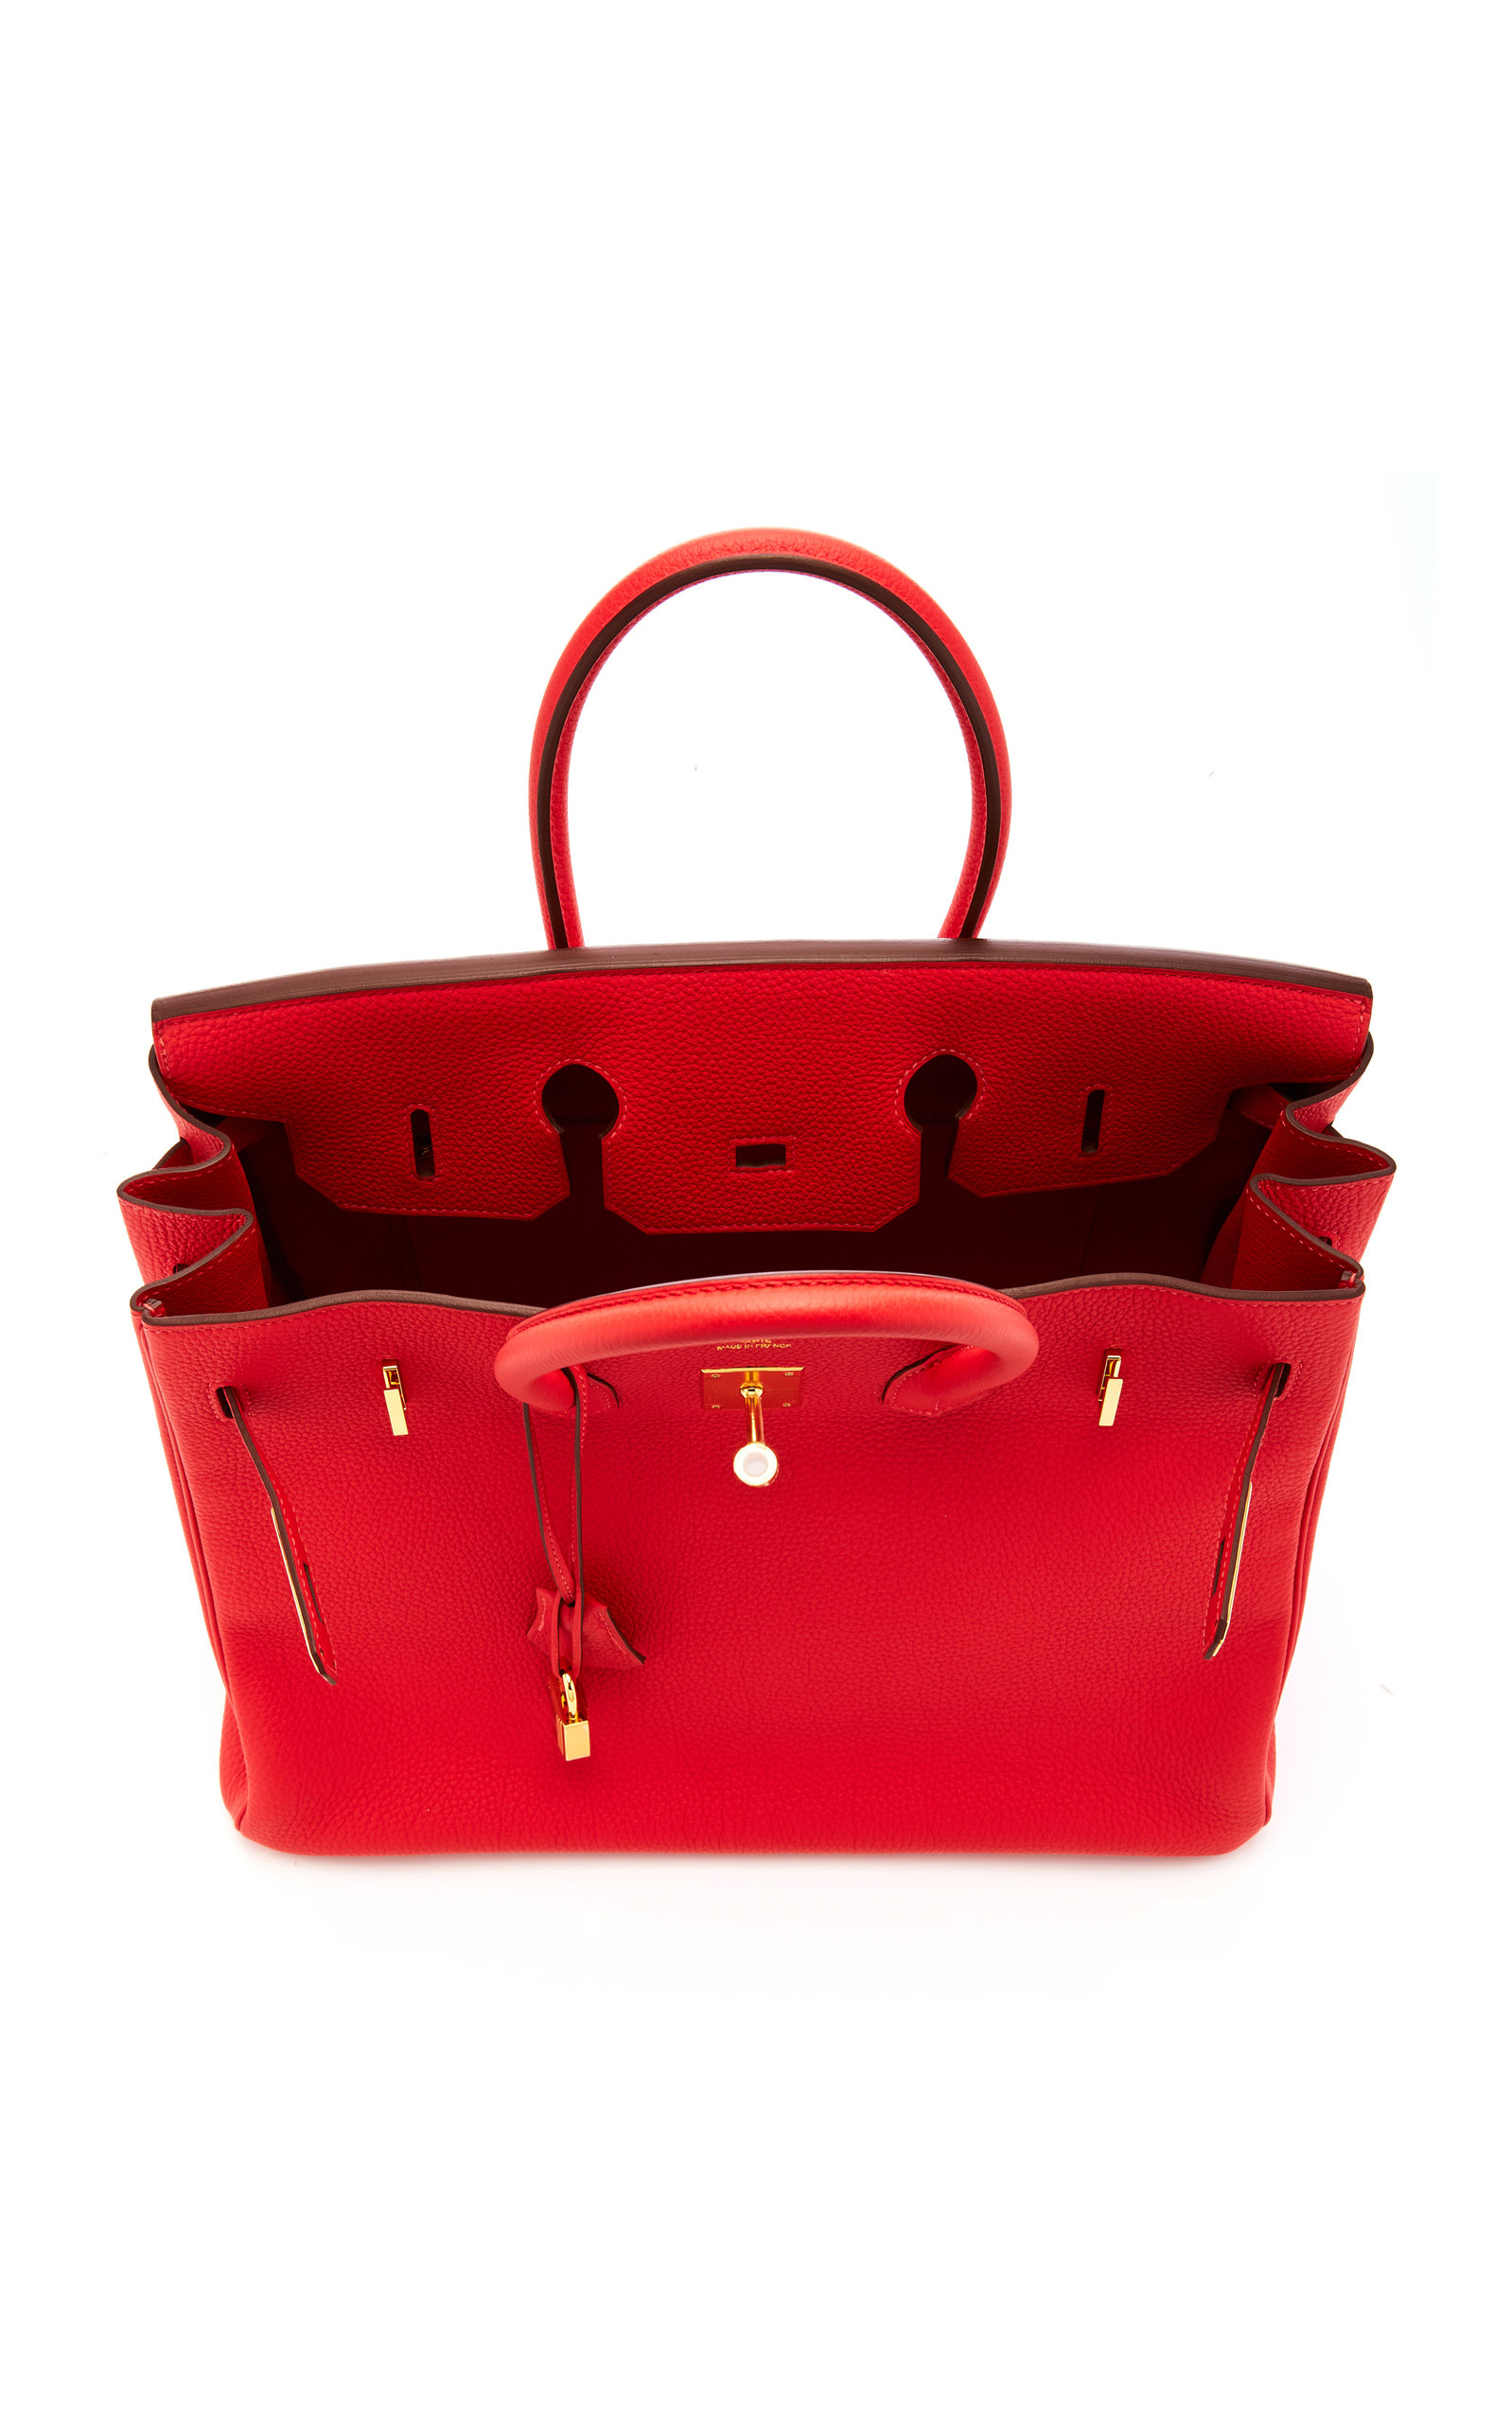 fb9cd4ba9024 ... AuctionsHermès 35cm Rouge Pivoine Togo Leather Birkin. CLOSE. Loading.  Loading. Loading. Loading. Loading